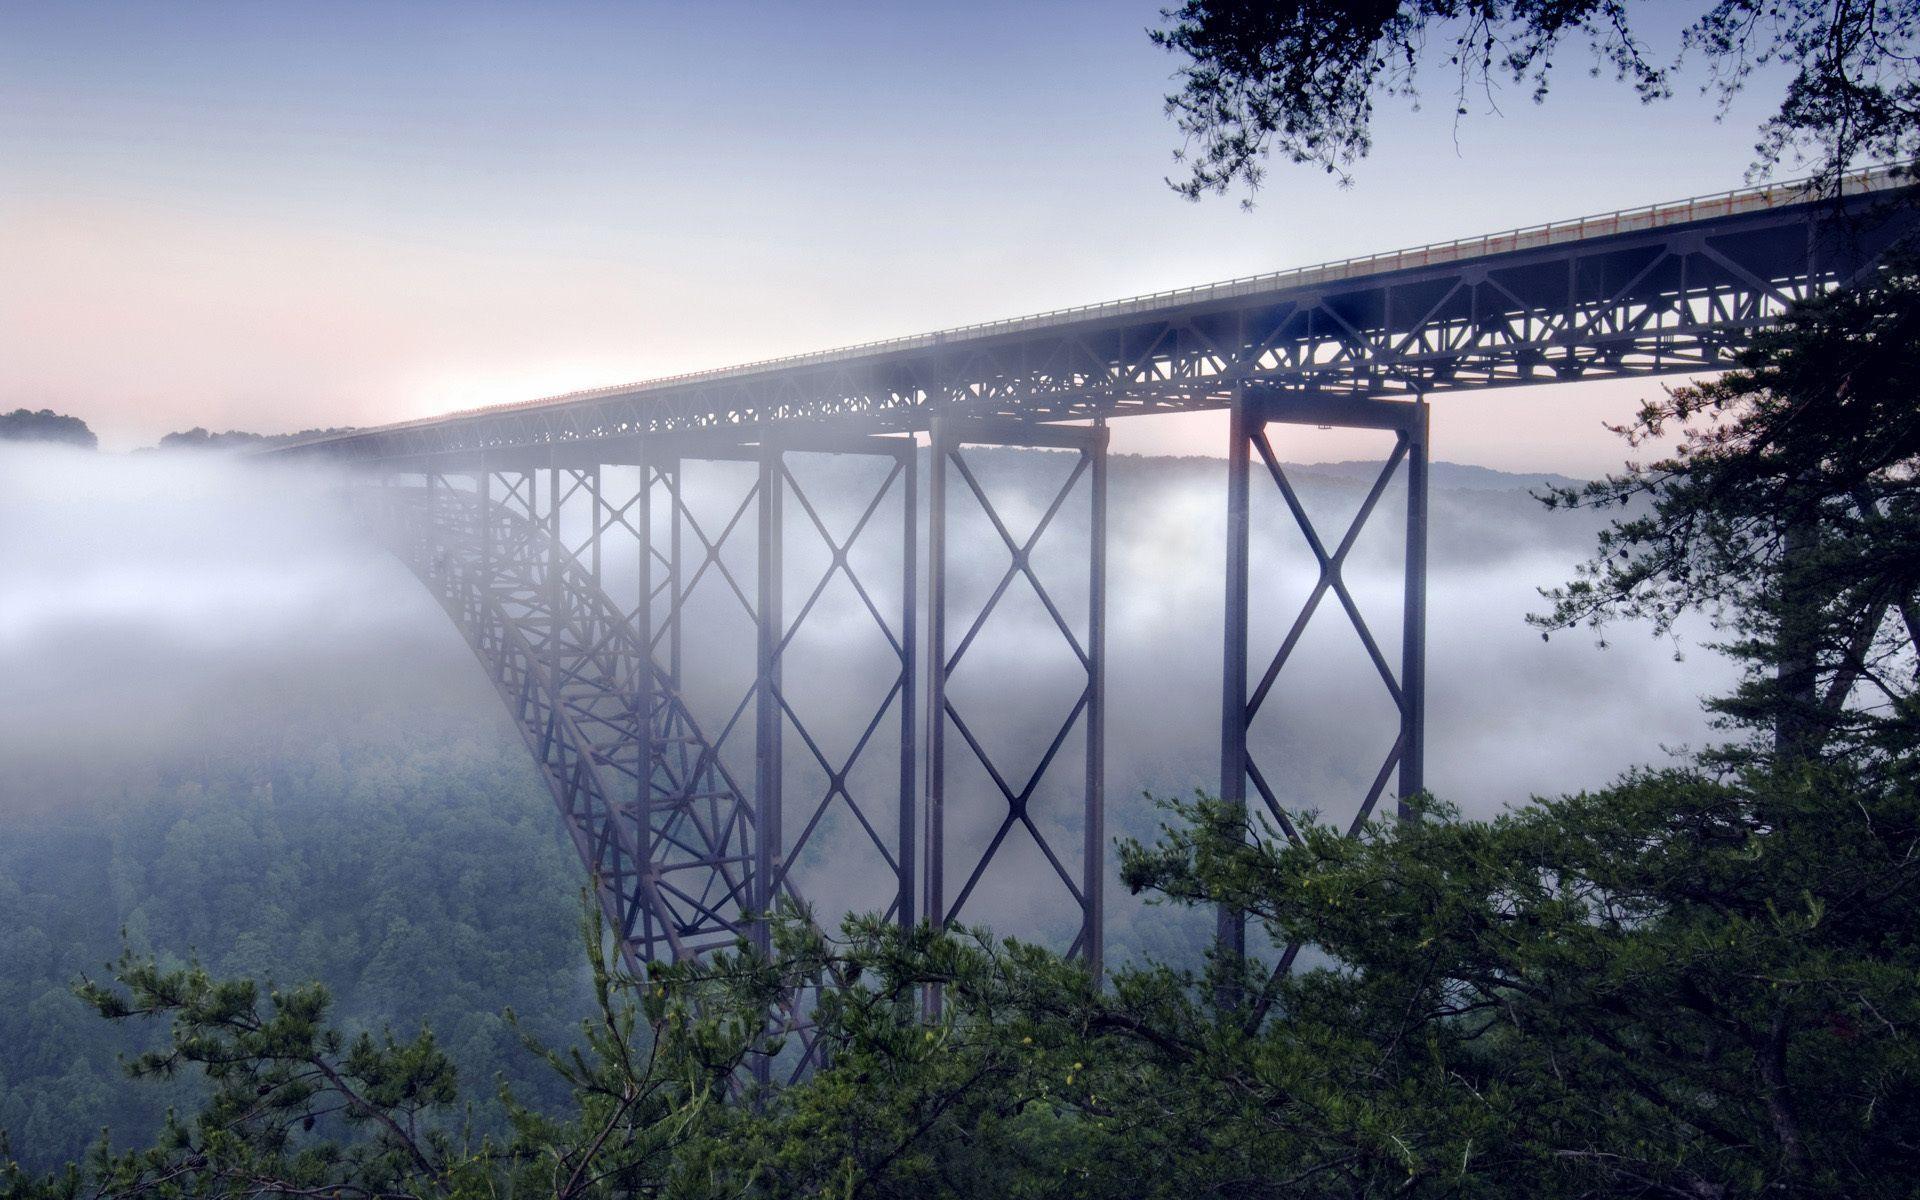 #landscape+bridge,+#New+river+gorge+bridge,+#the+fog